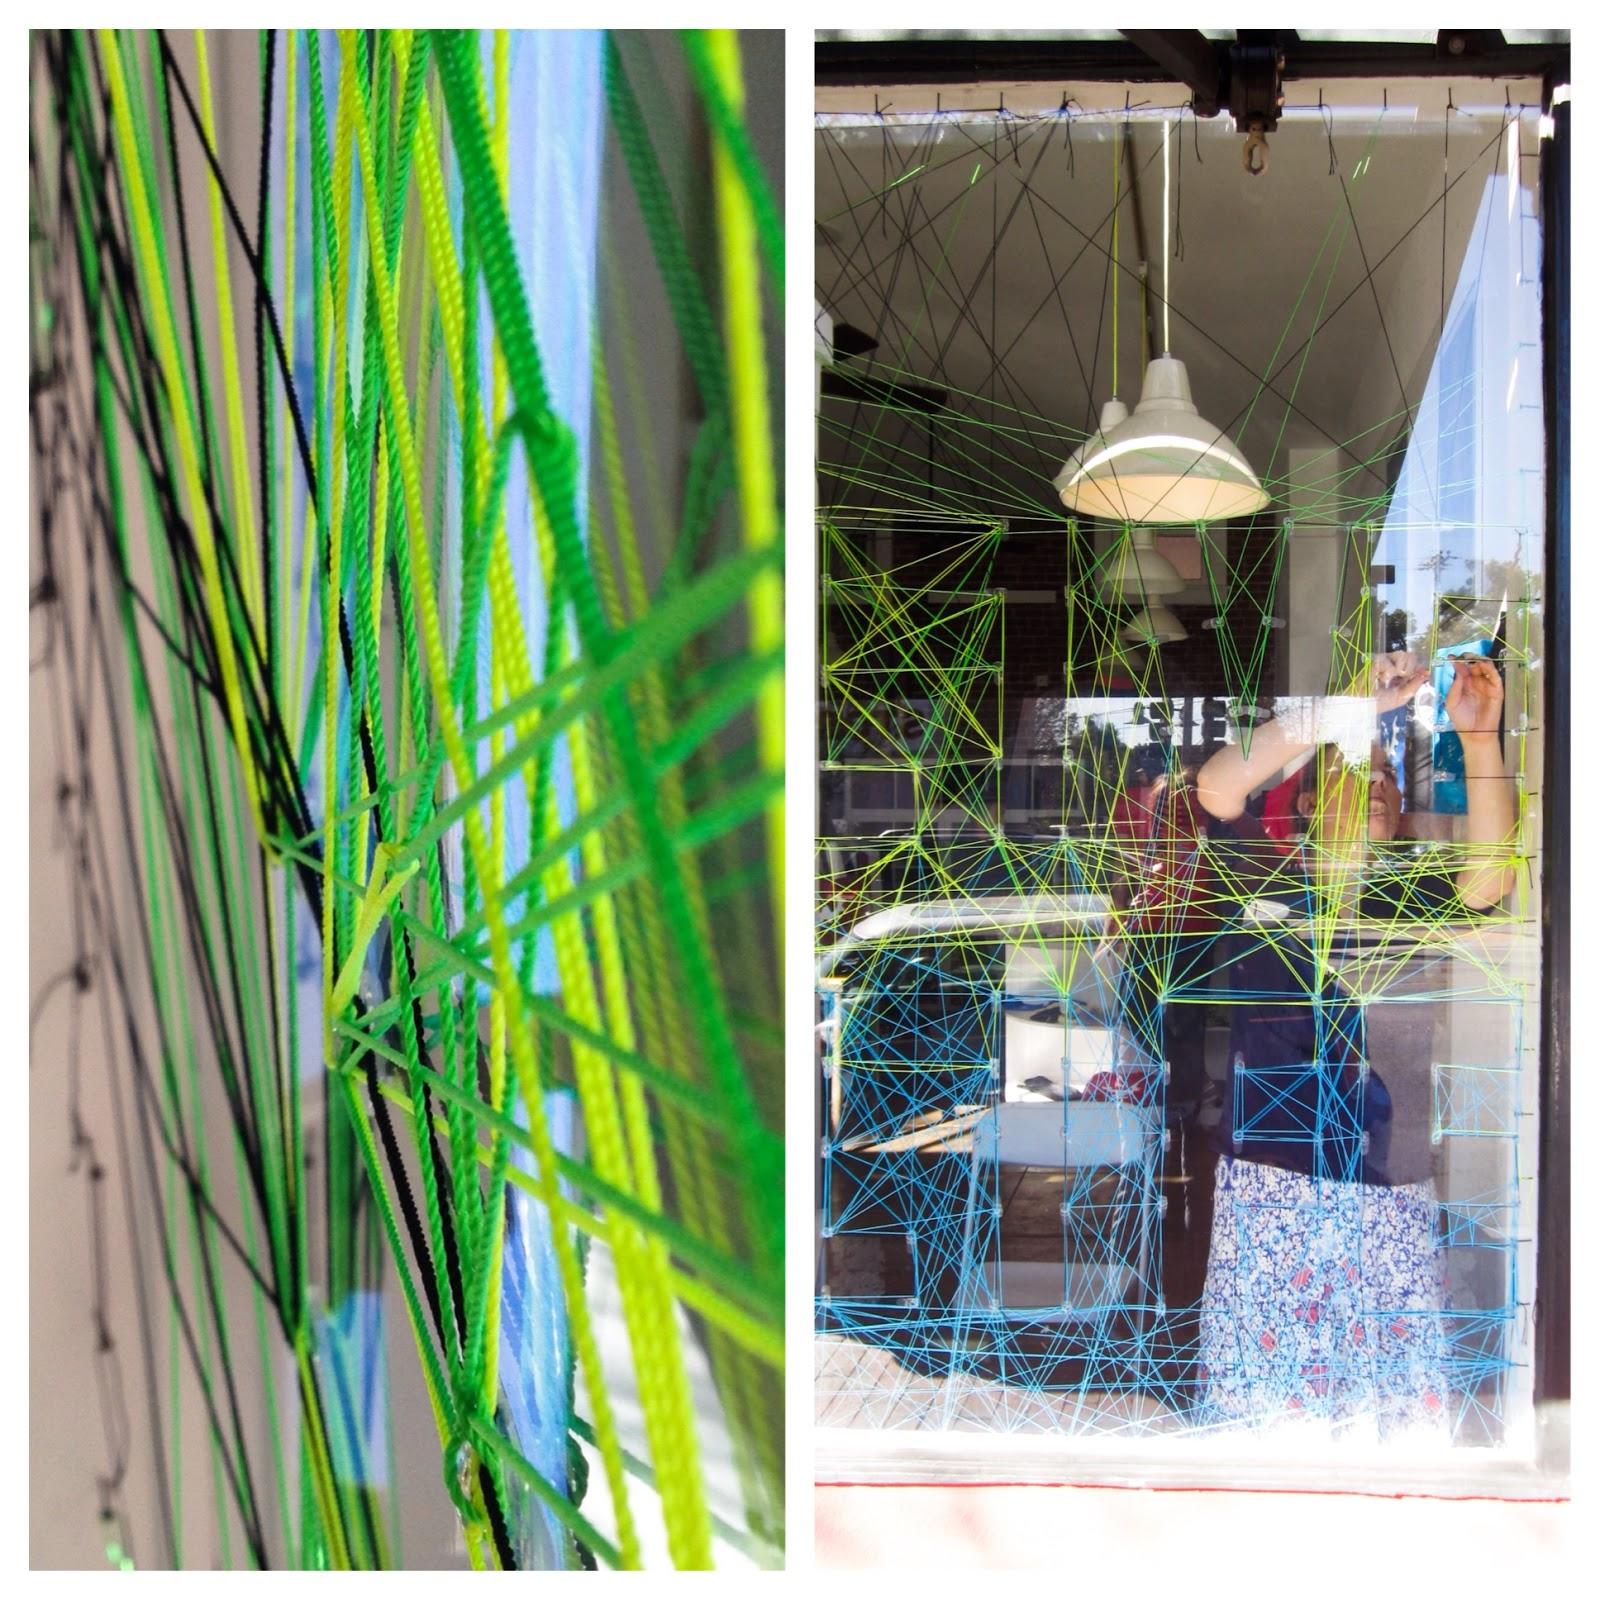 http://www.wodgearclothing.com/ string art window display with www.greenbugmarketplace.etsy.com